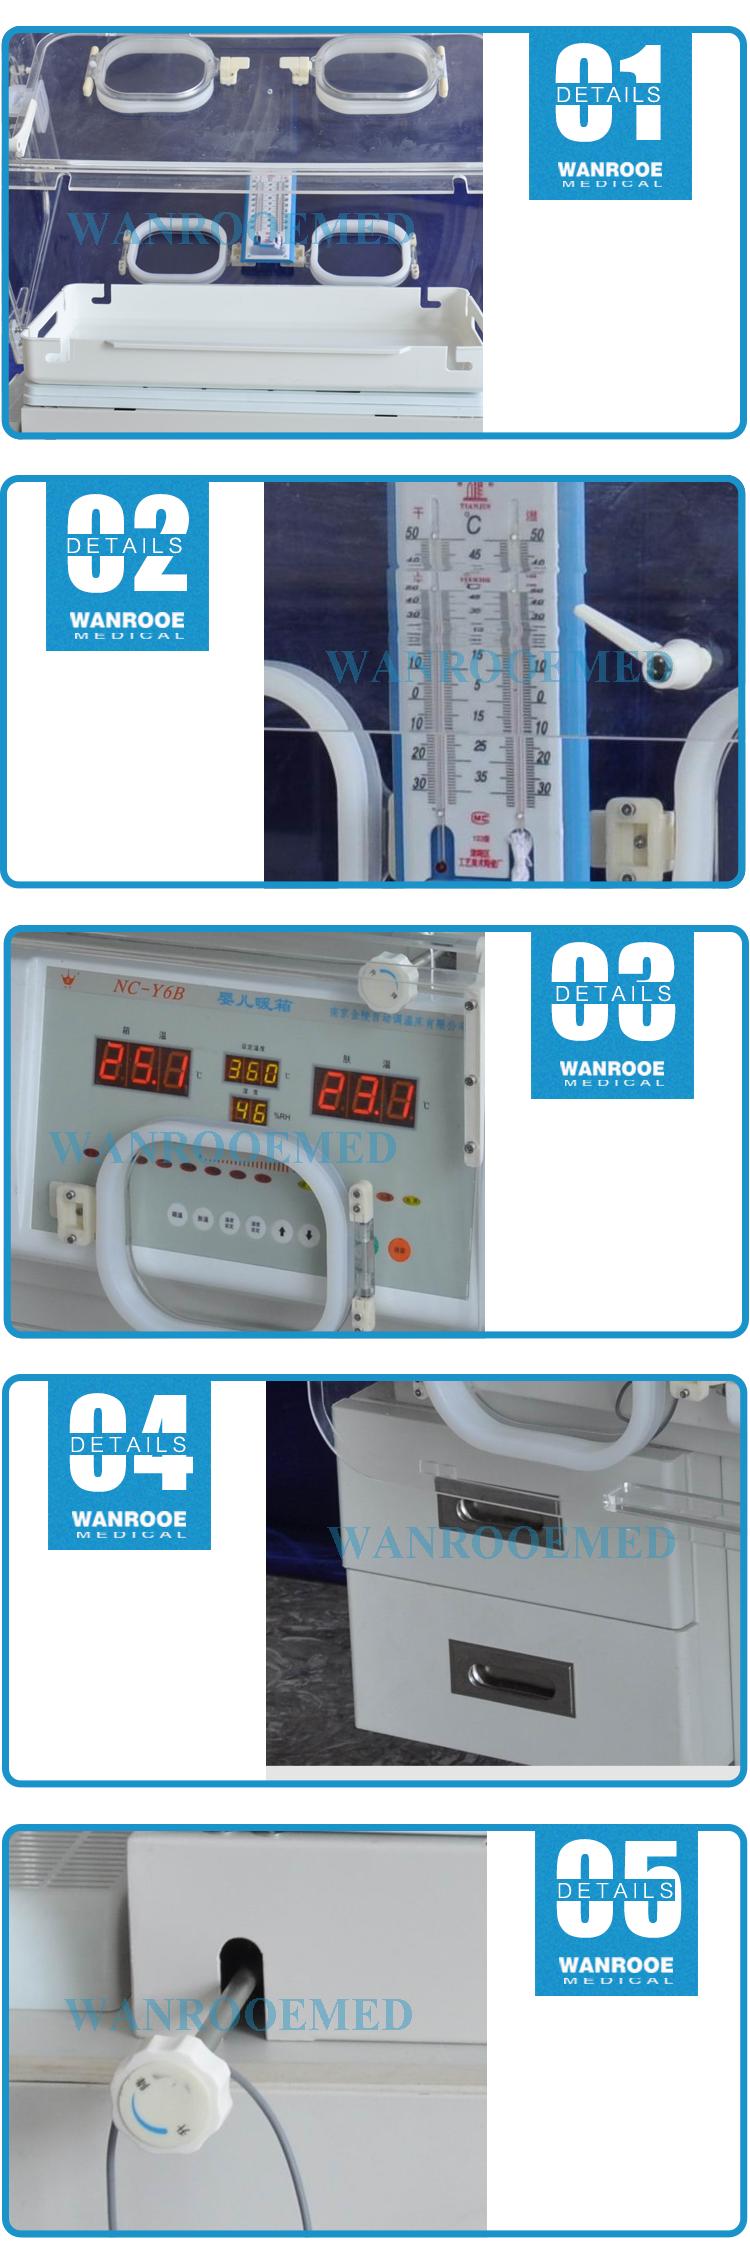 Infant Incubator, Infant Baby Incubator, Infant Baby Warmer, Infant Equipment, Baby Incubator